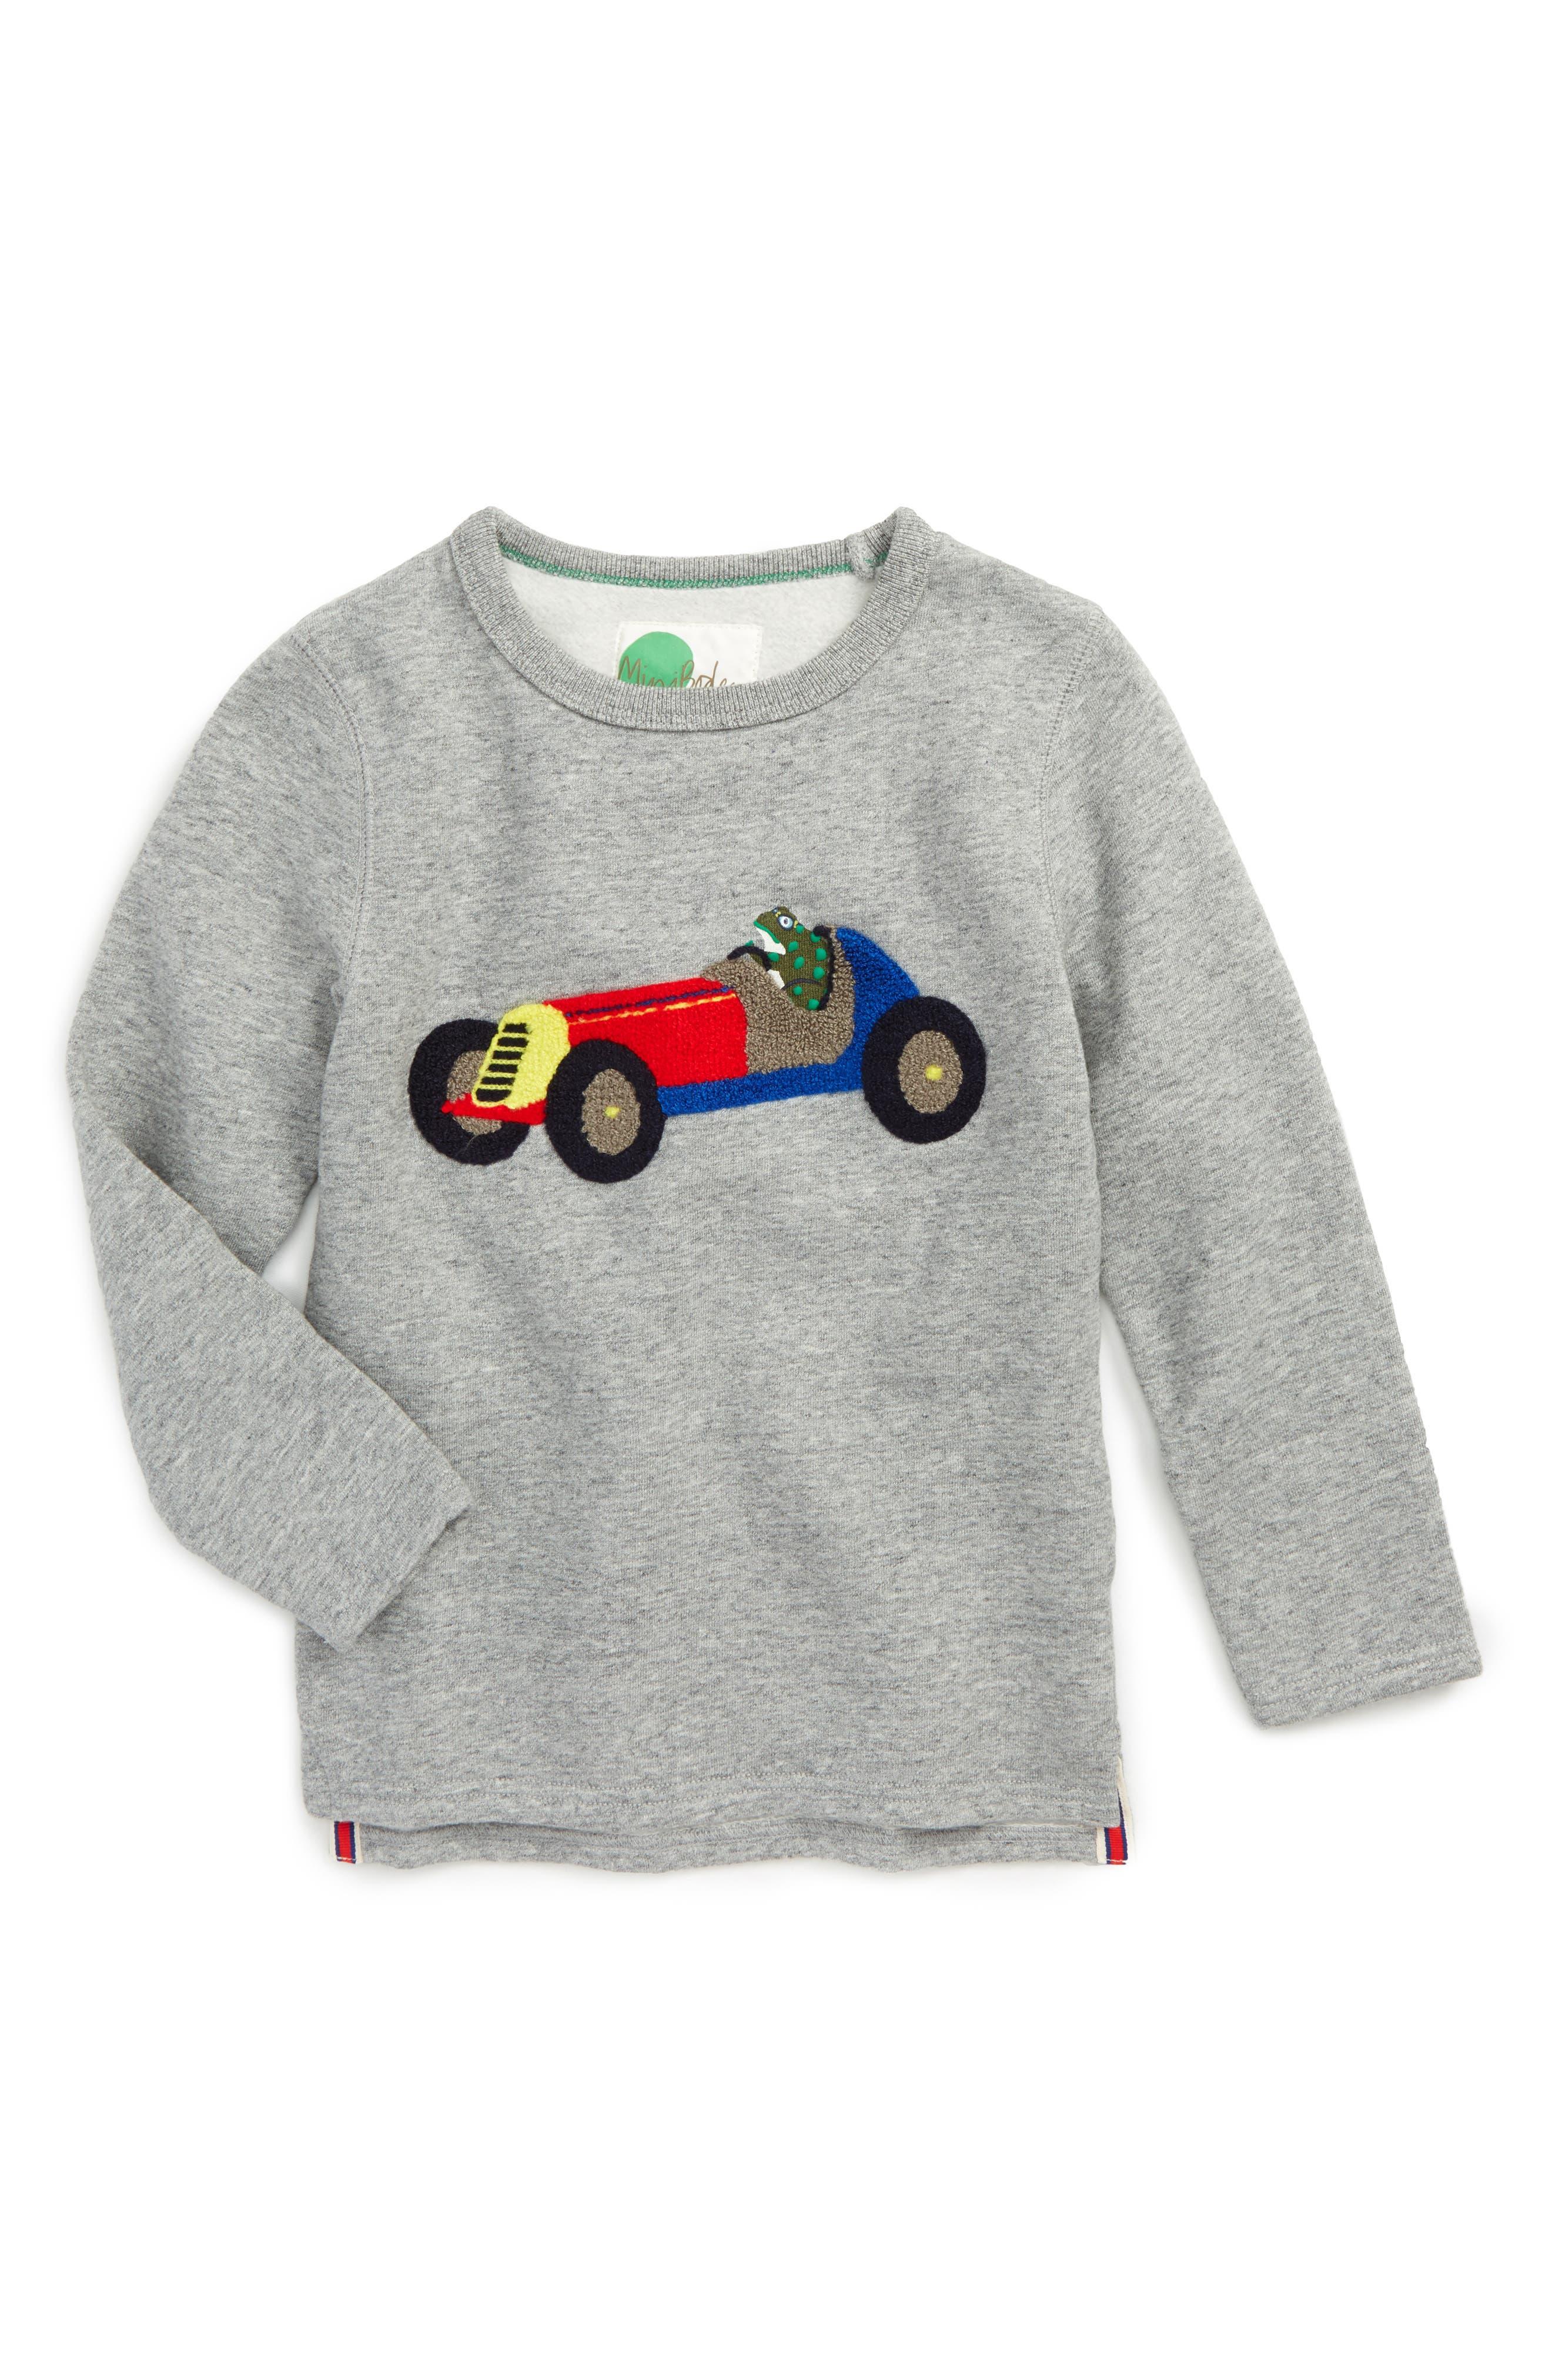 MINI BODEN Open Road Sweatshirt